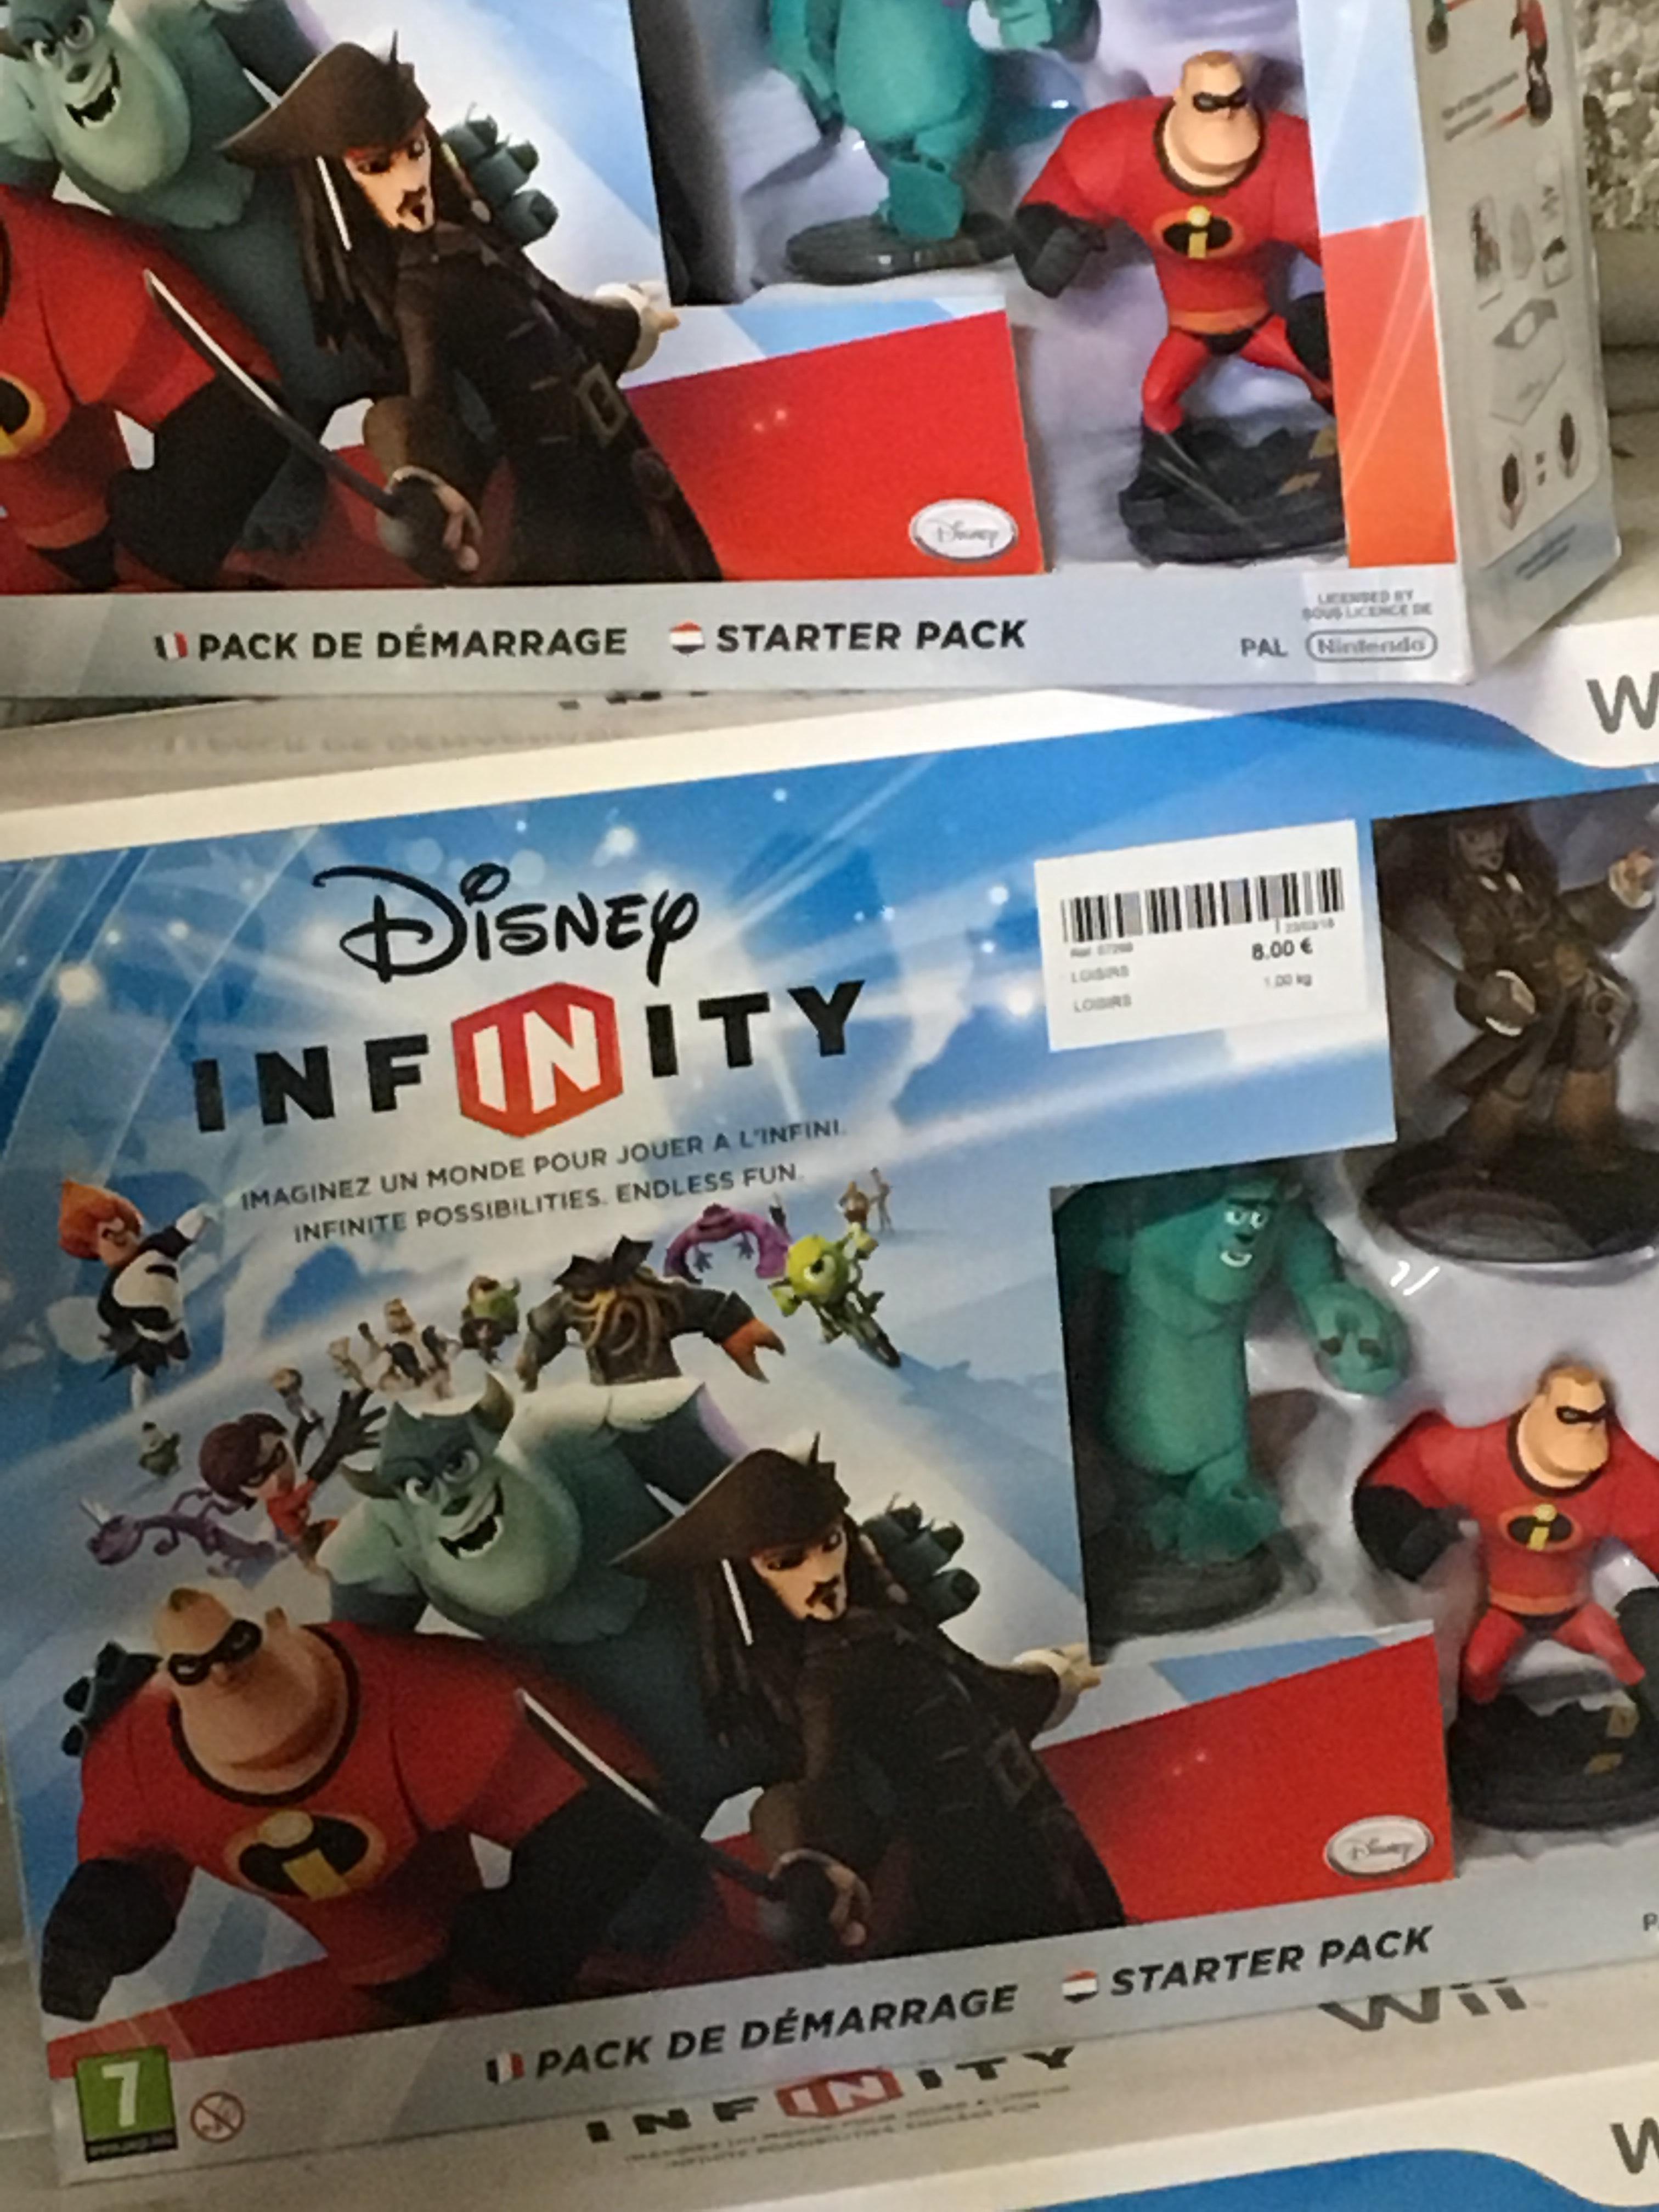 Pack de démarrage Disney Infinity sur Nintendo WII - La Recyclerie Drumettaz-Clarafond (73)